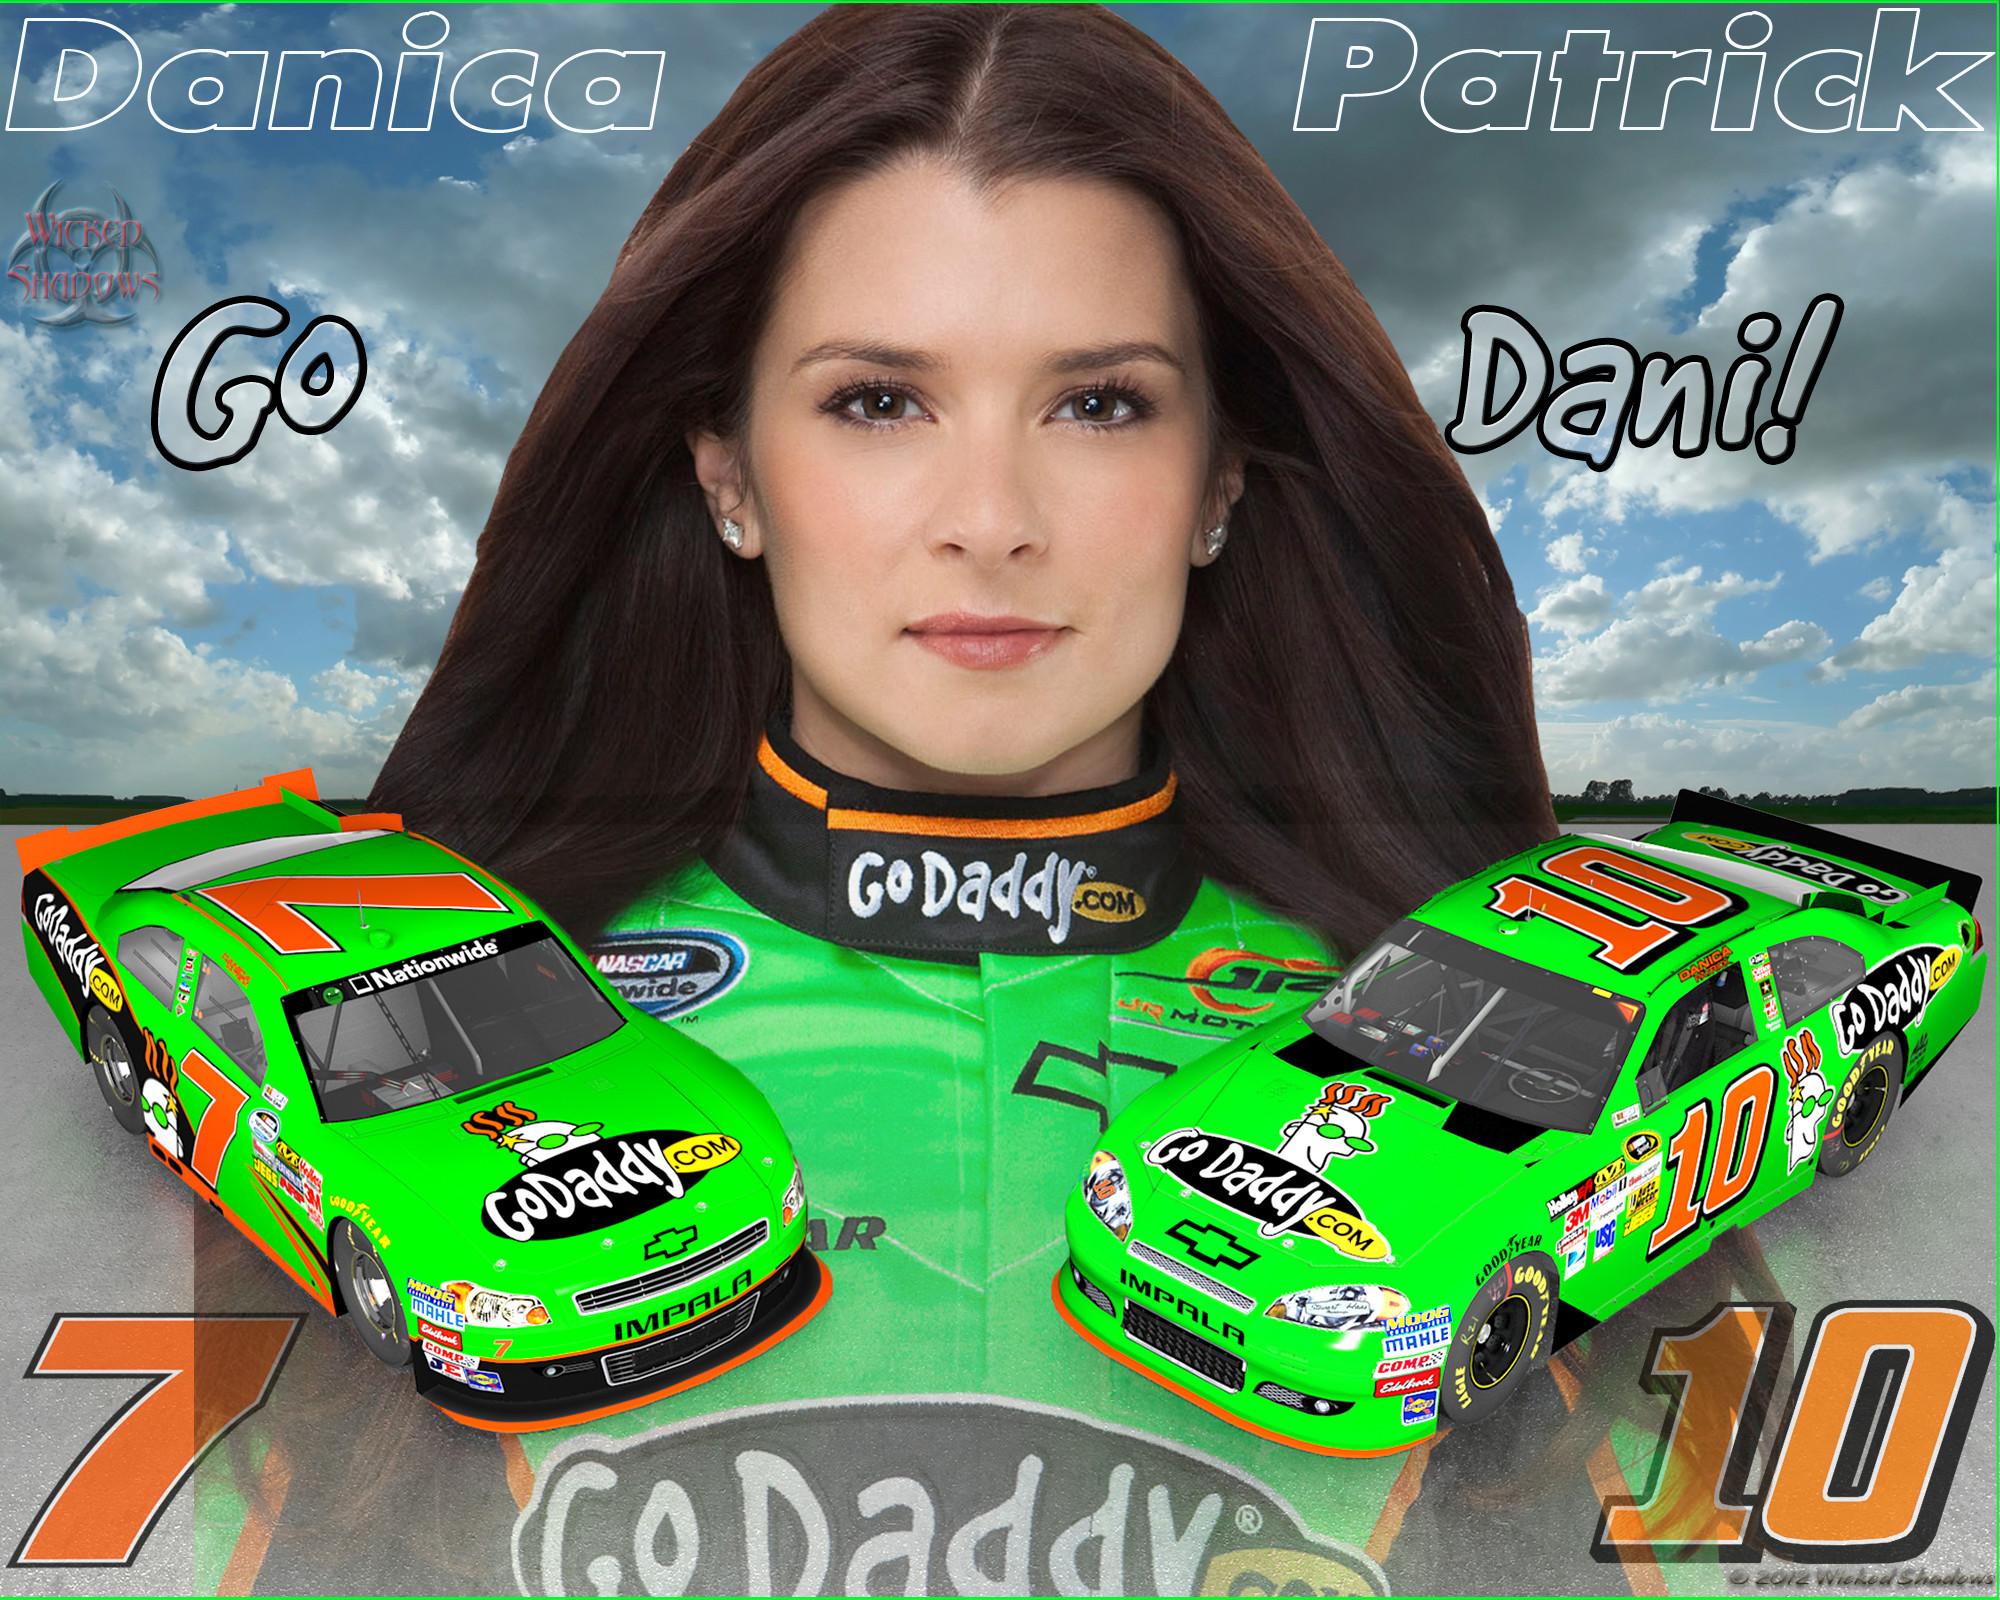 … 5×4 | 16×9 | 16×10 | 1920×1408 Tablet Danica Patrick Go Dani 2012  Wallpaper …